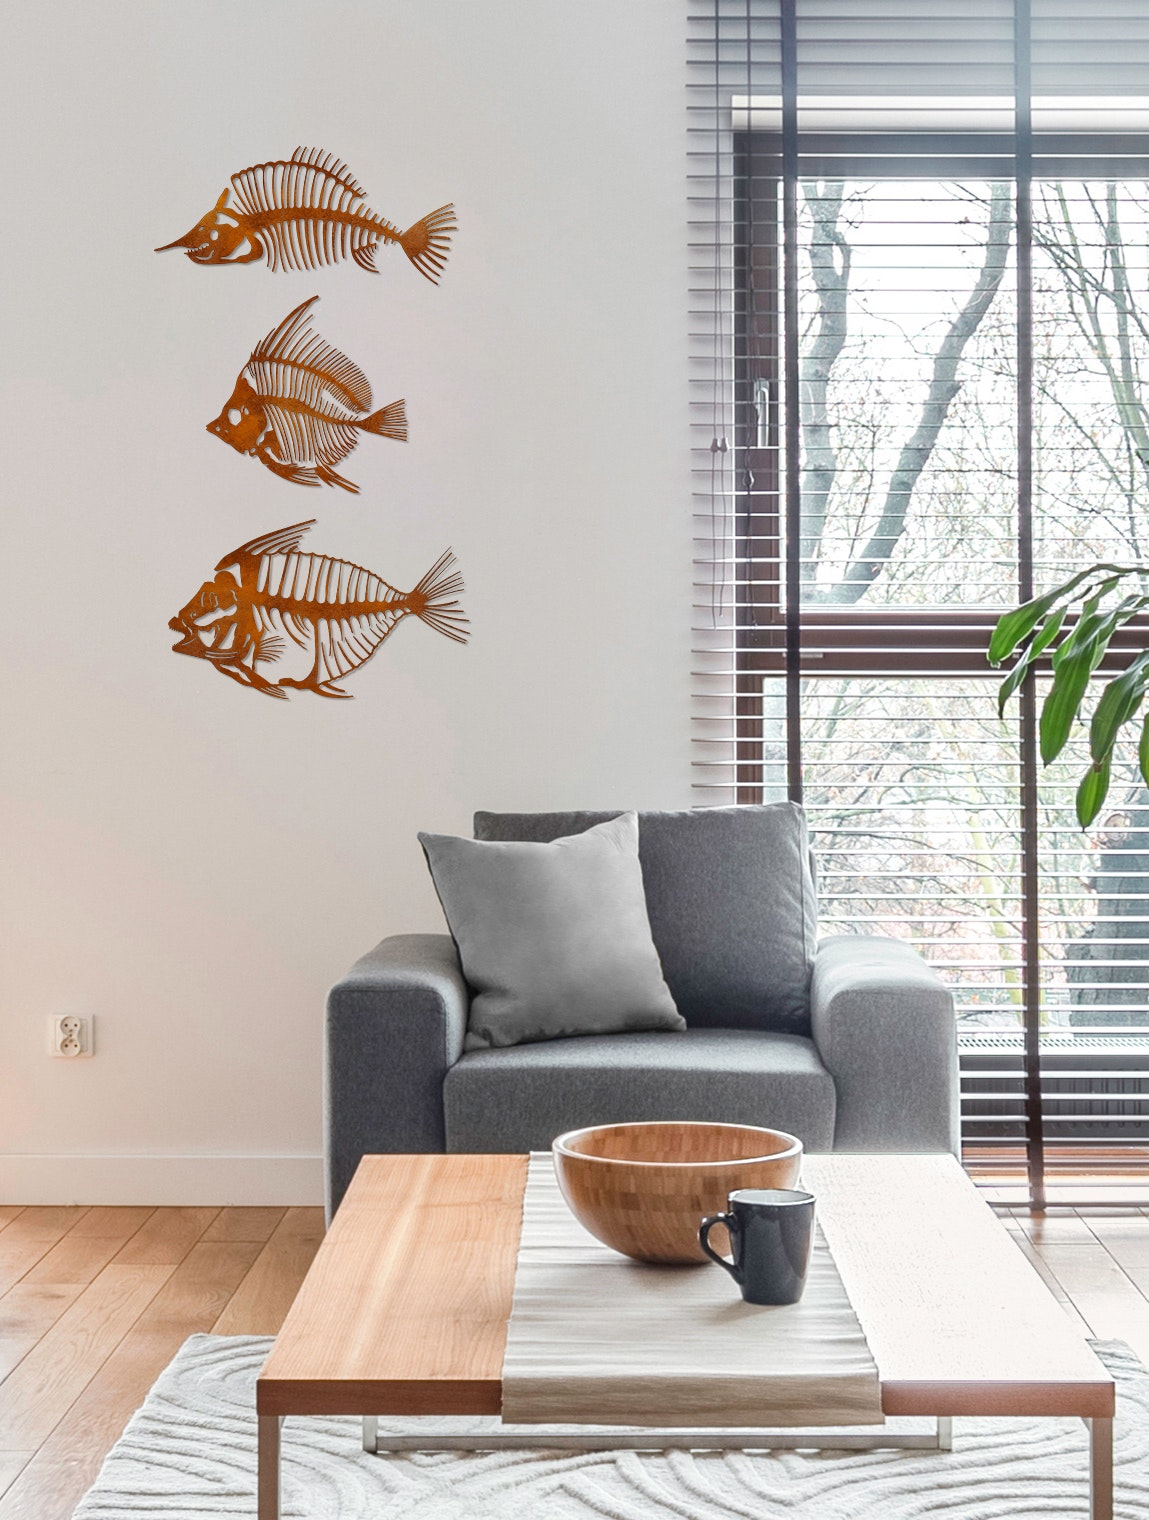 3er Fisch-Set in Edelrost-Optik